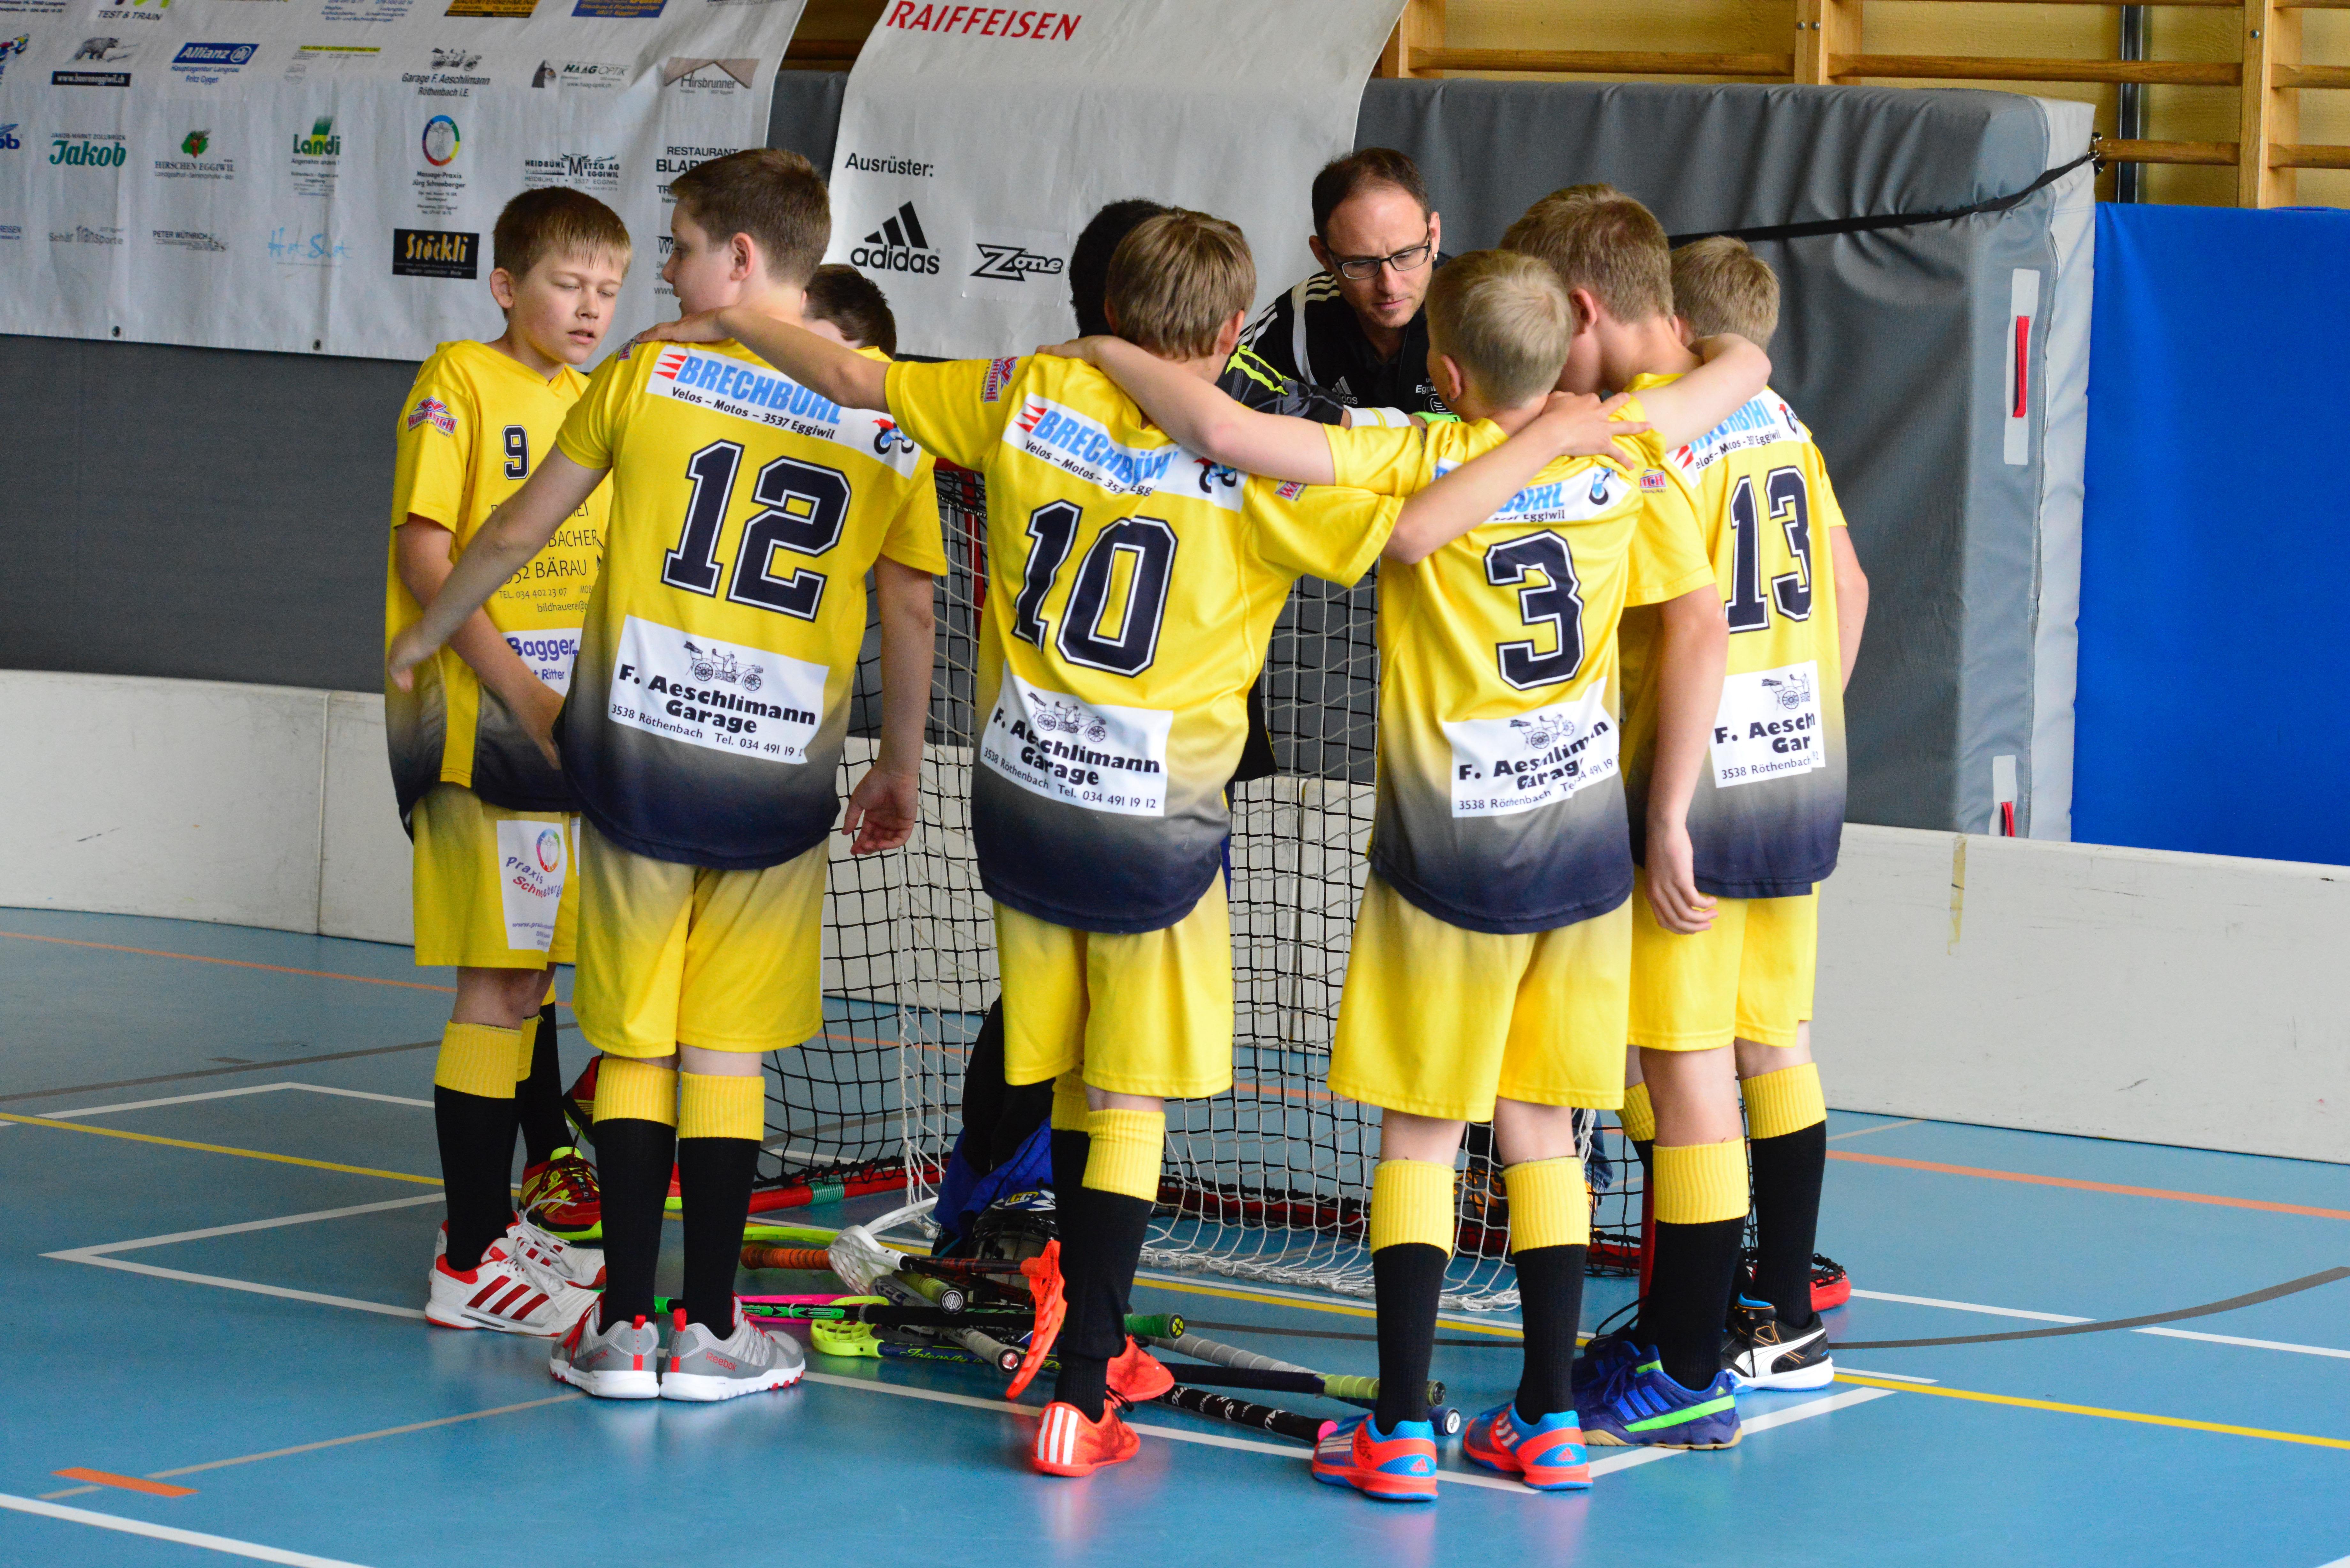 Junioren C - Ämme-Valley Cup Saison 2015/16